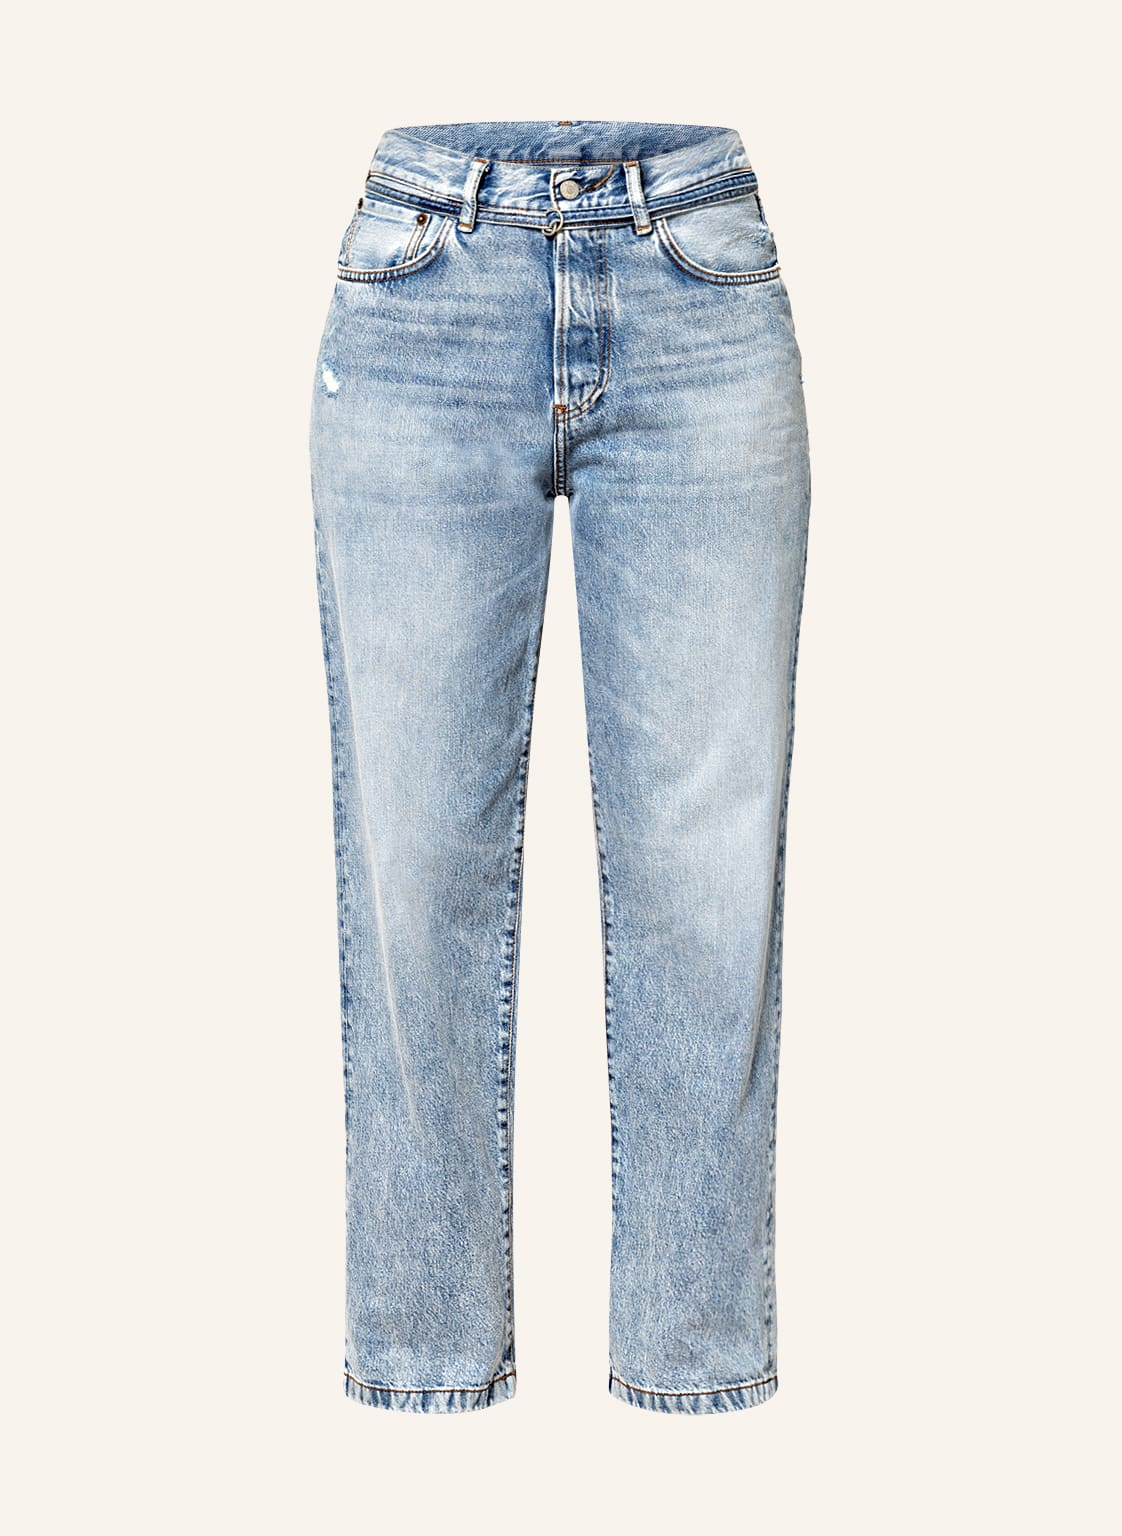 Image of Acne Studios Boyfriend Jeans blau